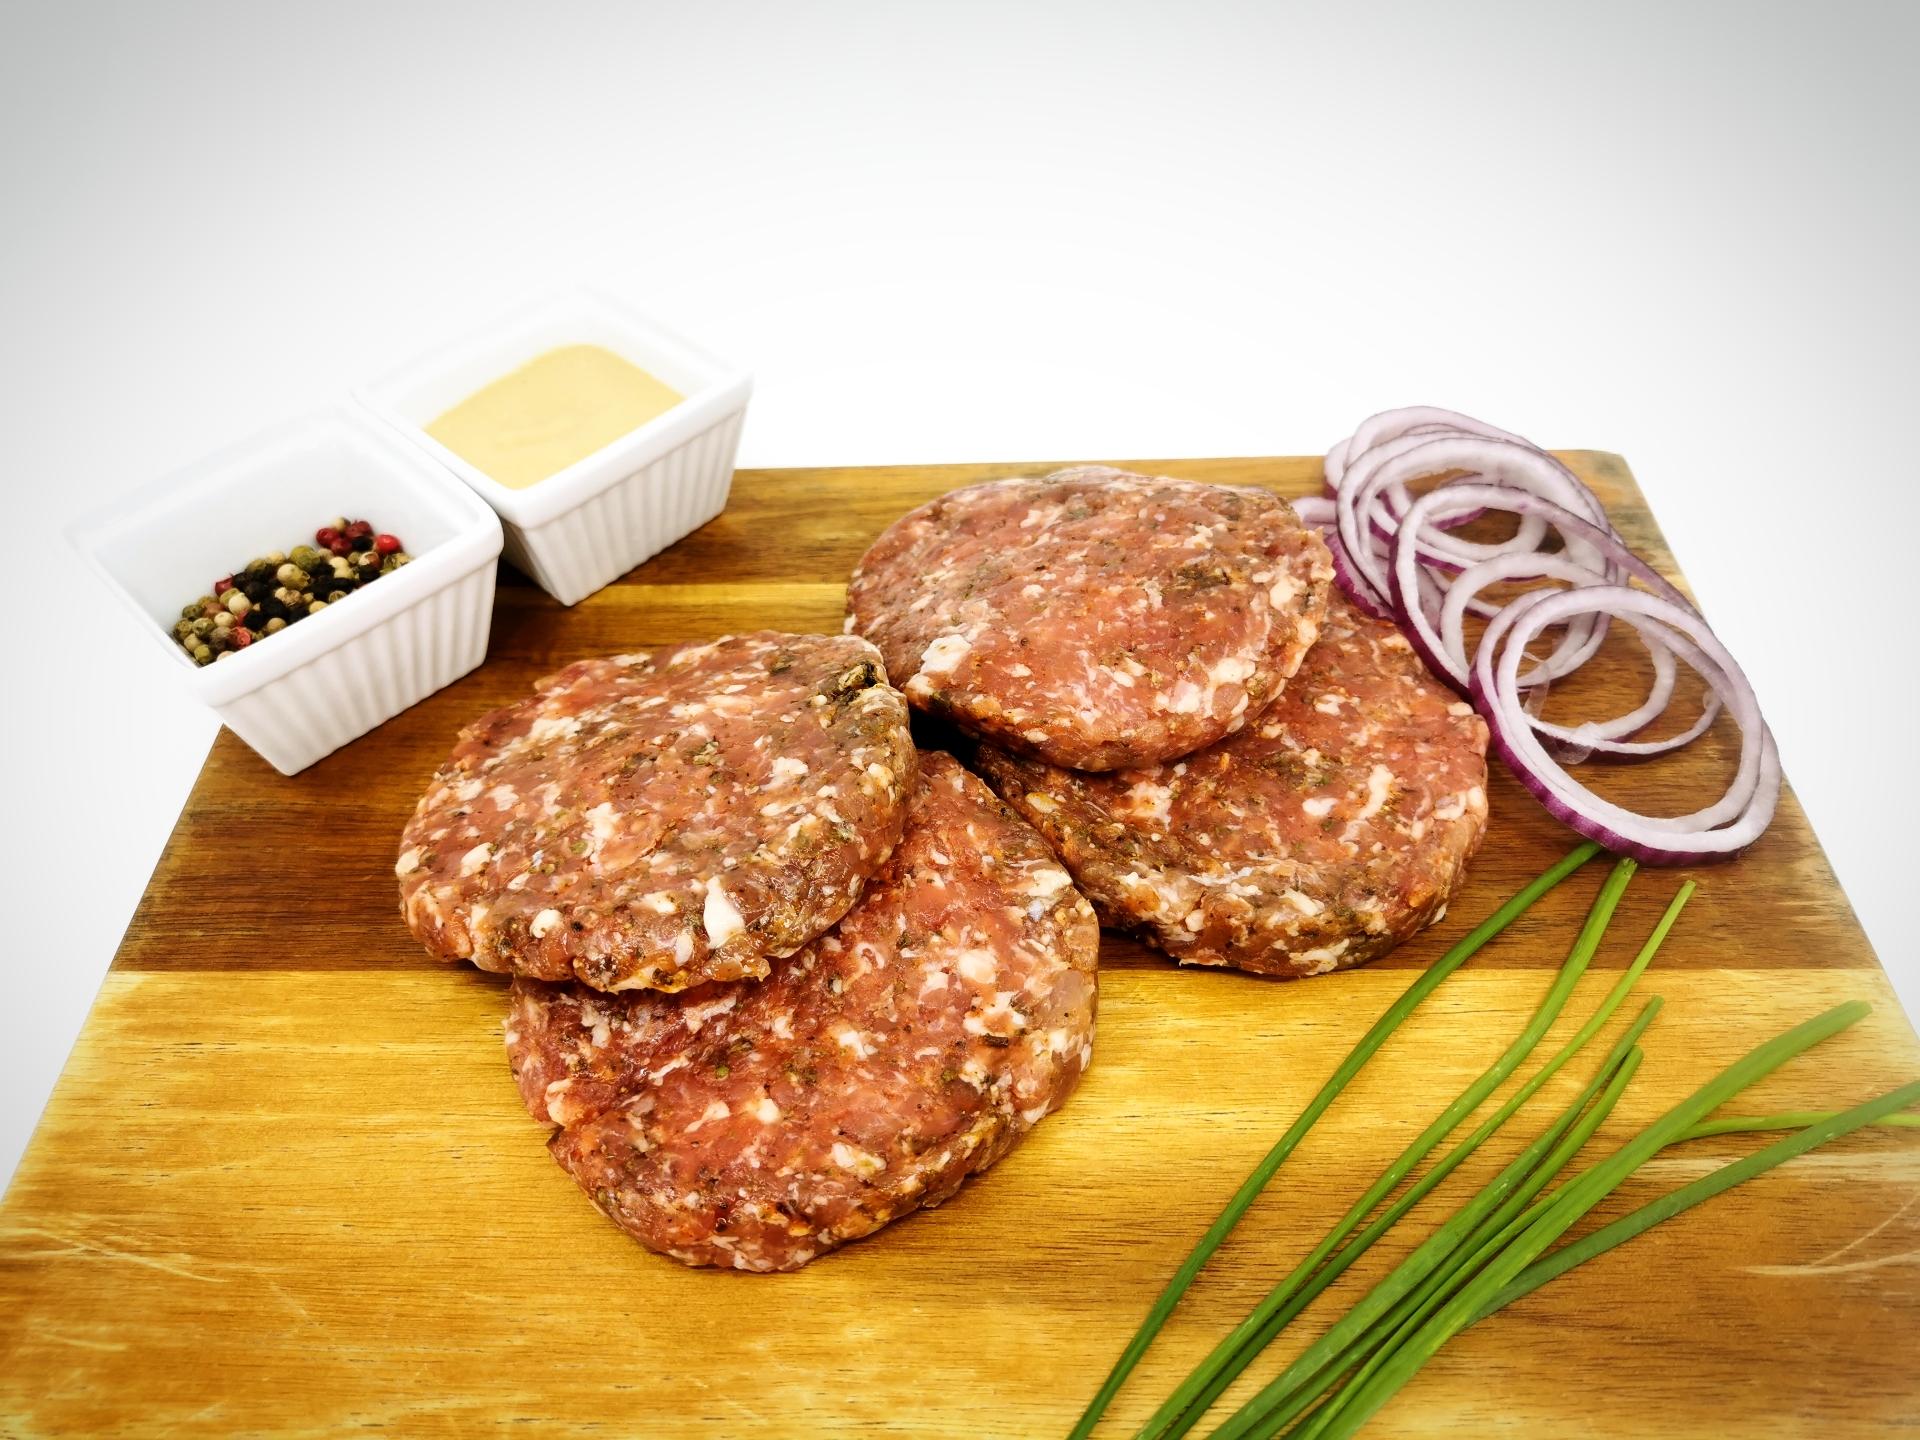 American sausage patty 360g / Americké masové placičky 360g